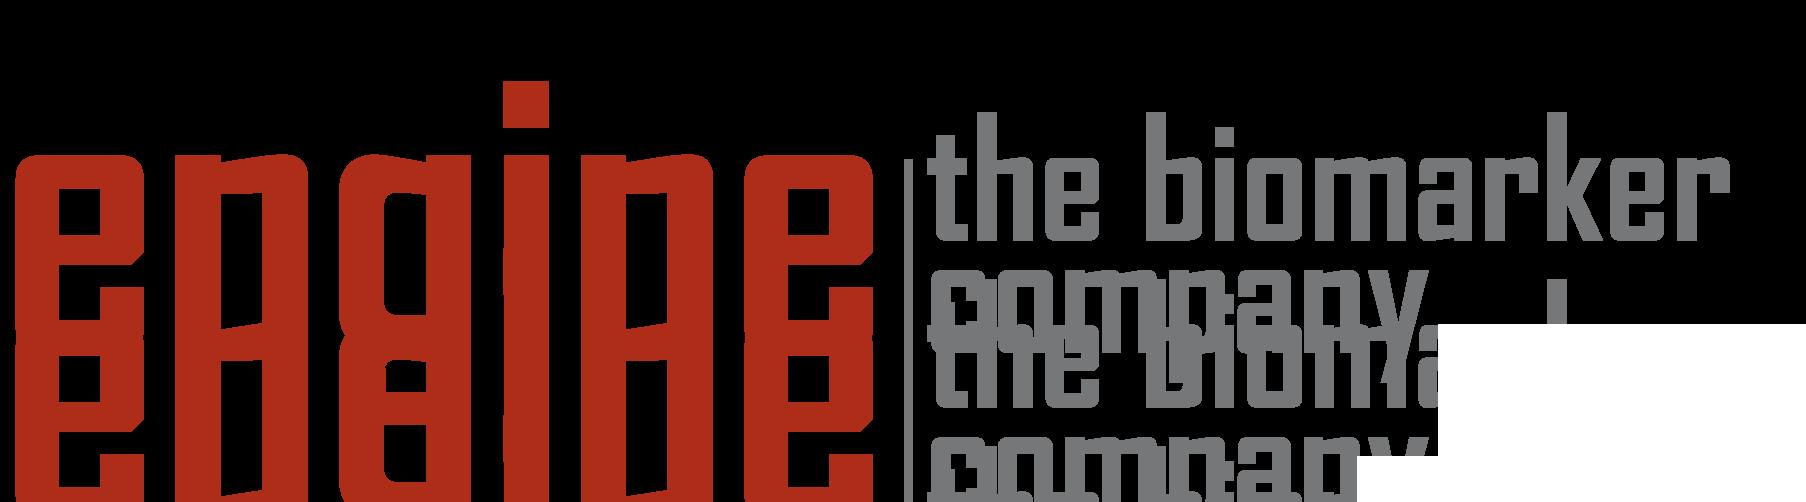 engine the biomarker company